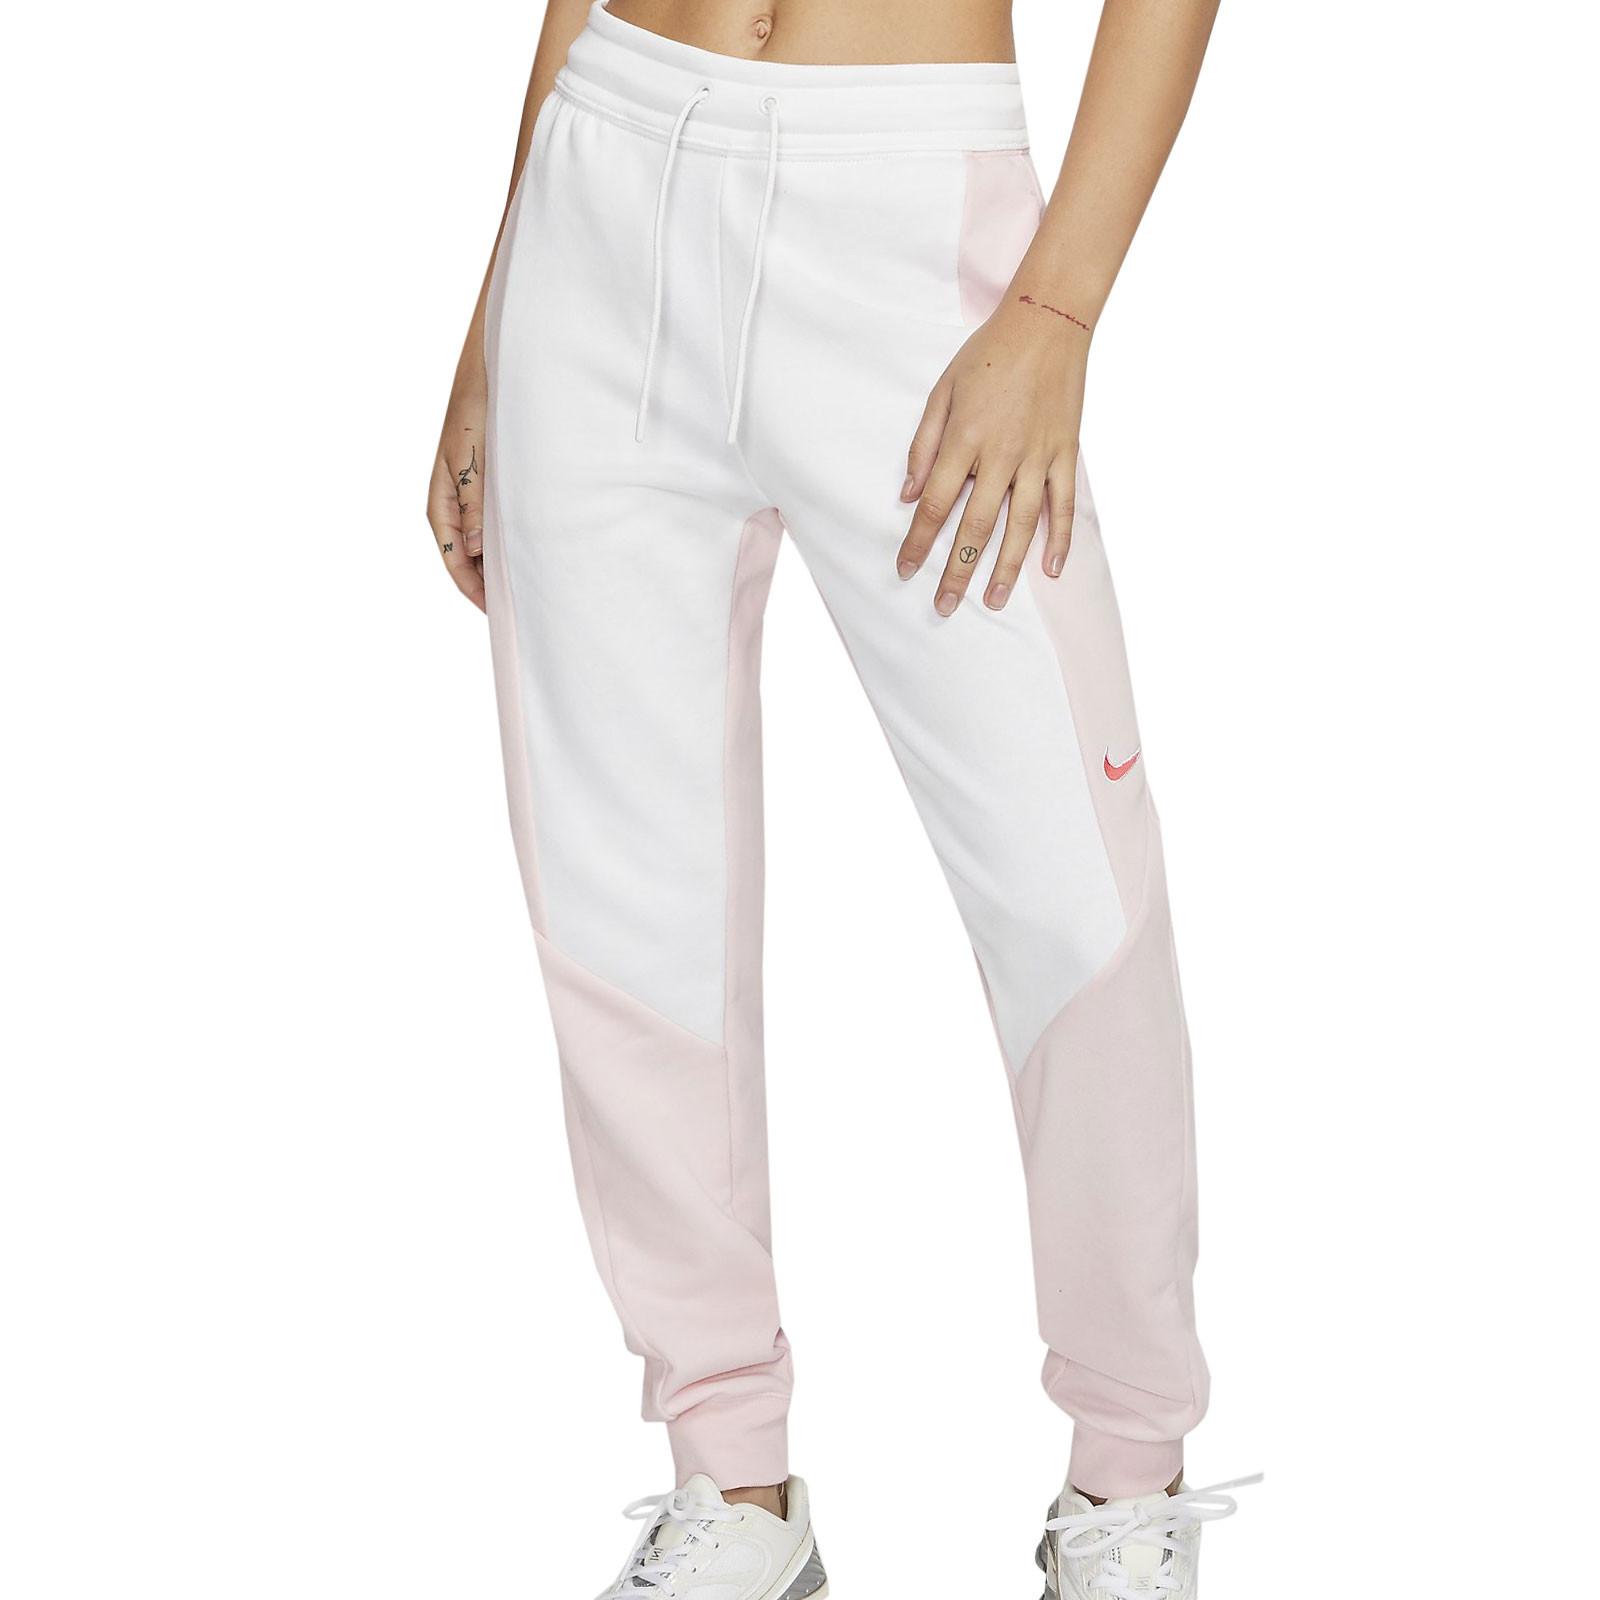 Pantalon Nike Mujer Jogger Blanco Rosa Futbolmania